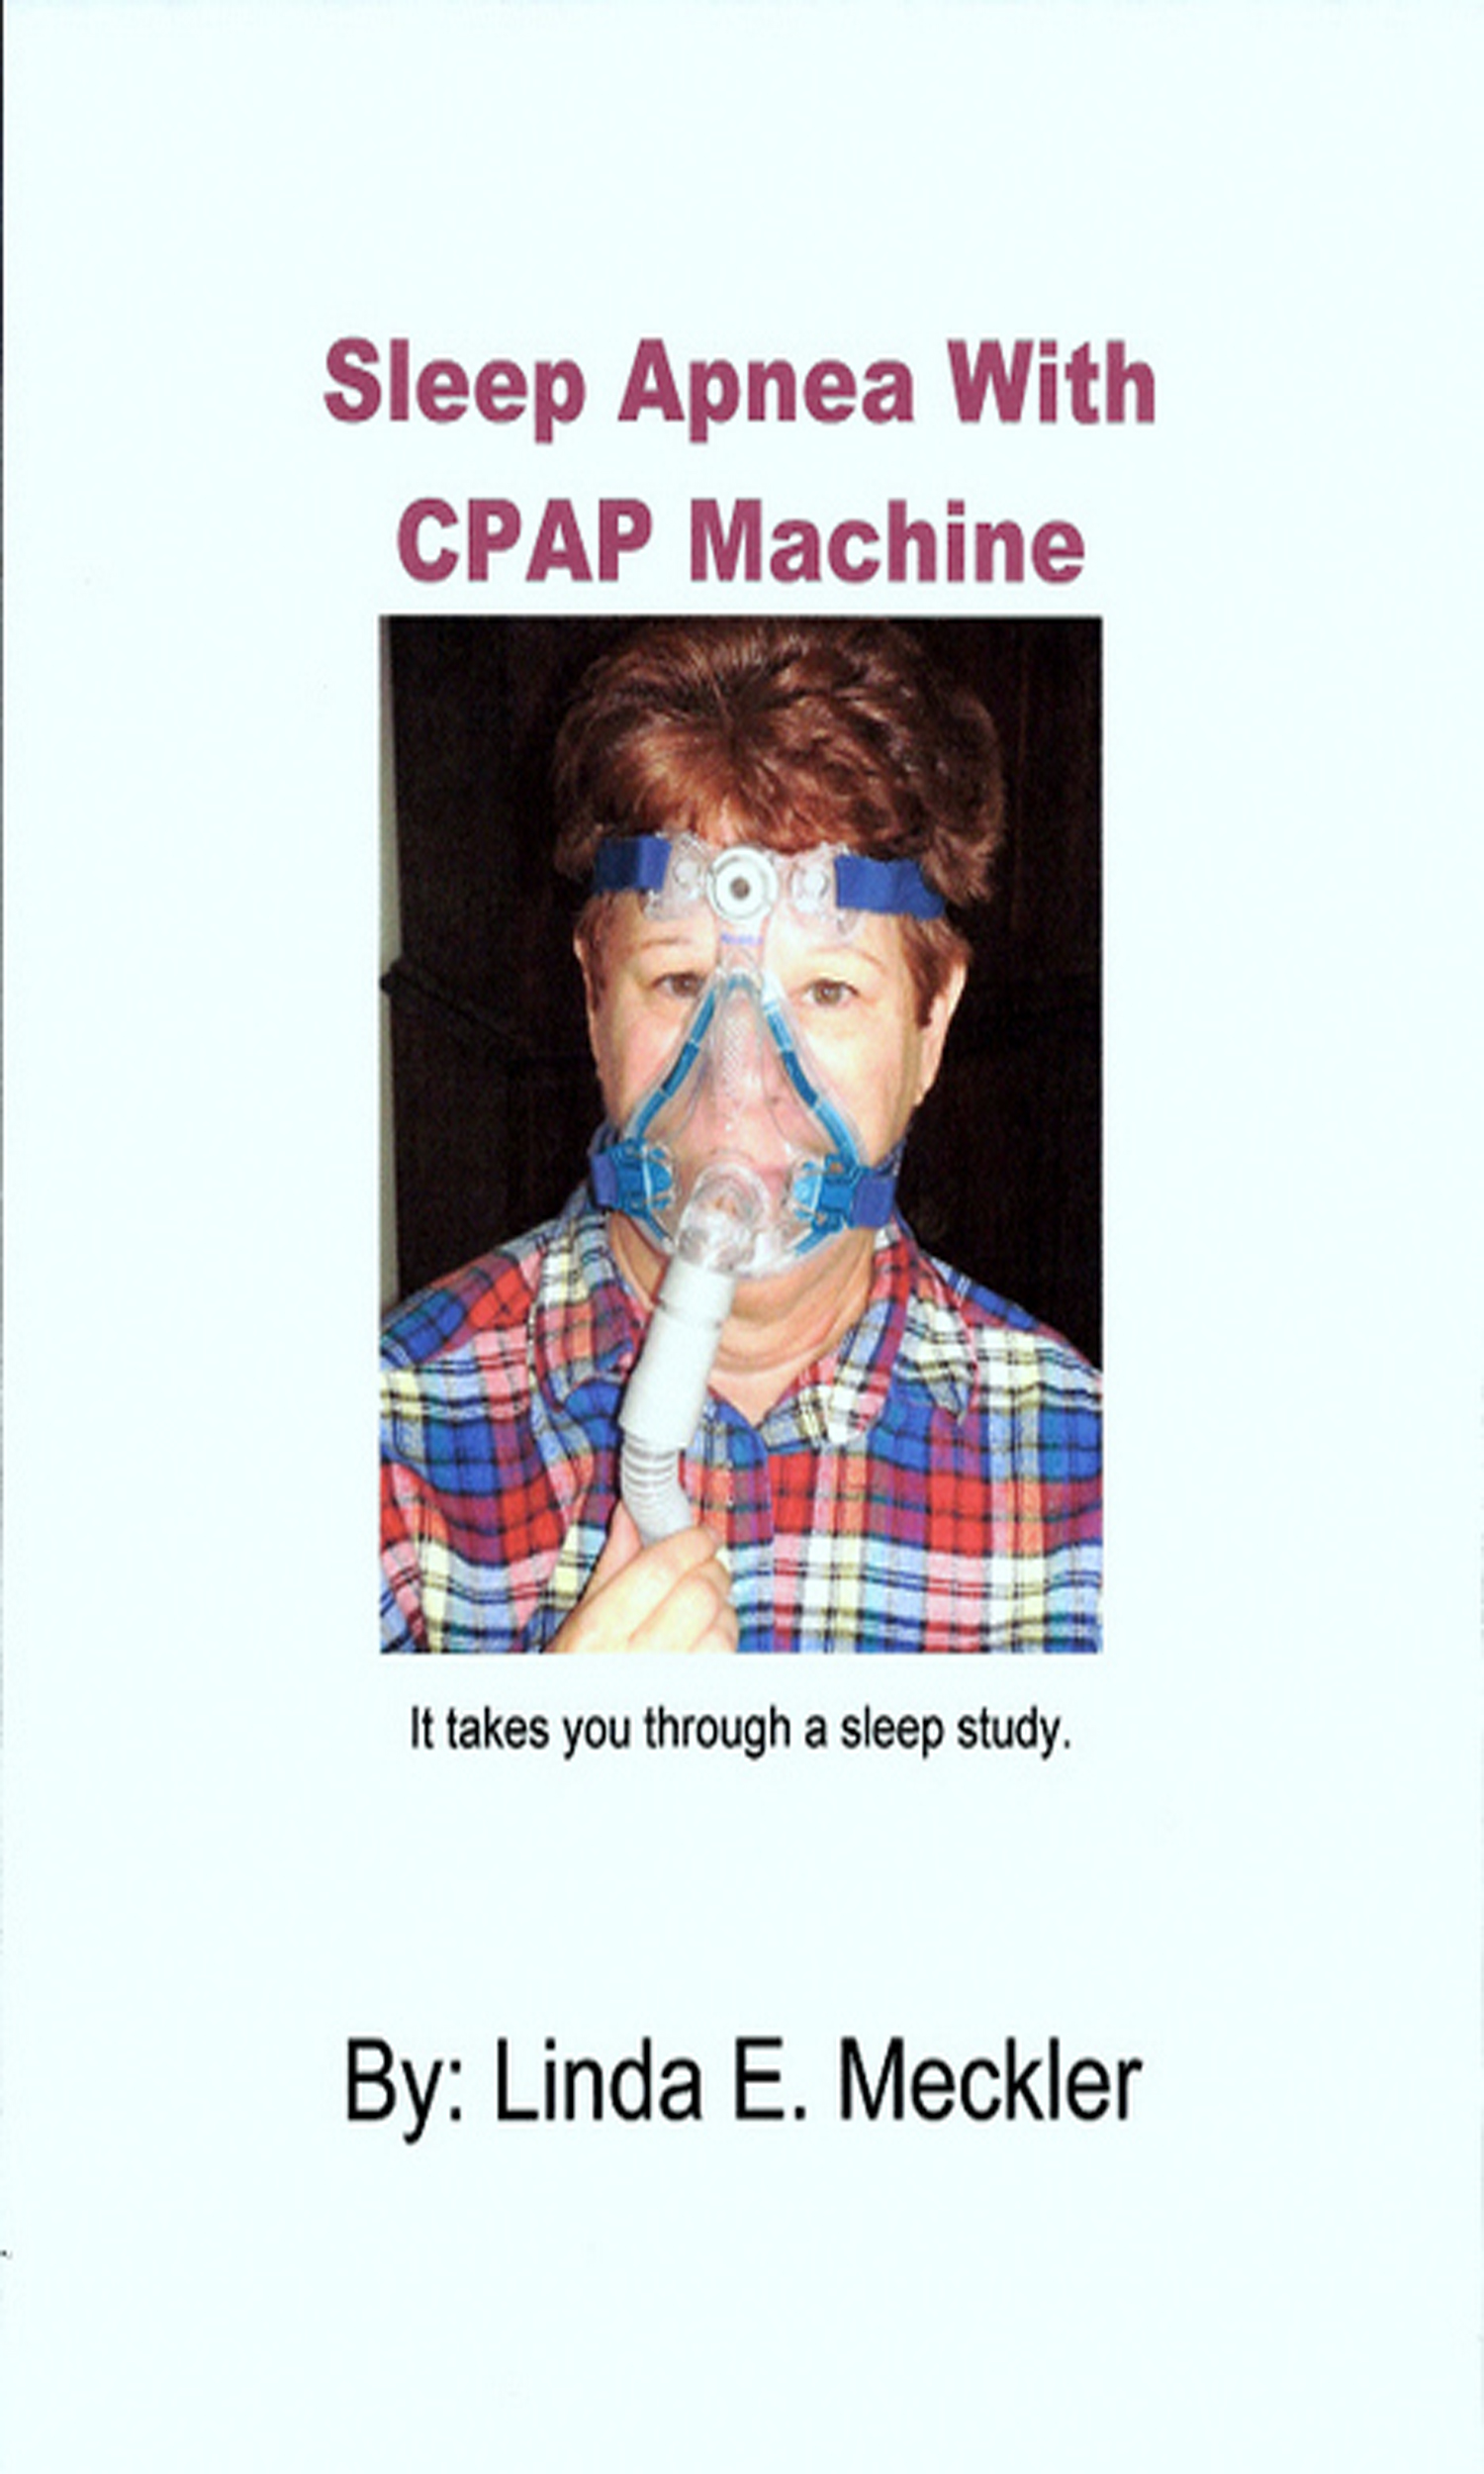 Sleep Apnea With CPAP Machine and Sleep Study, an Ebook by Linda Meckler